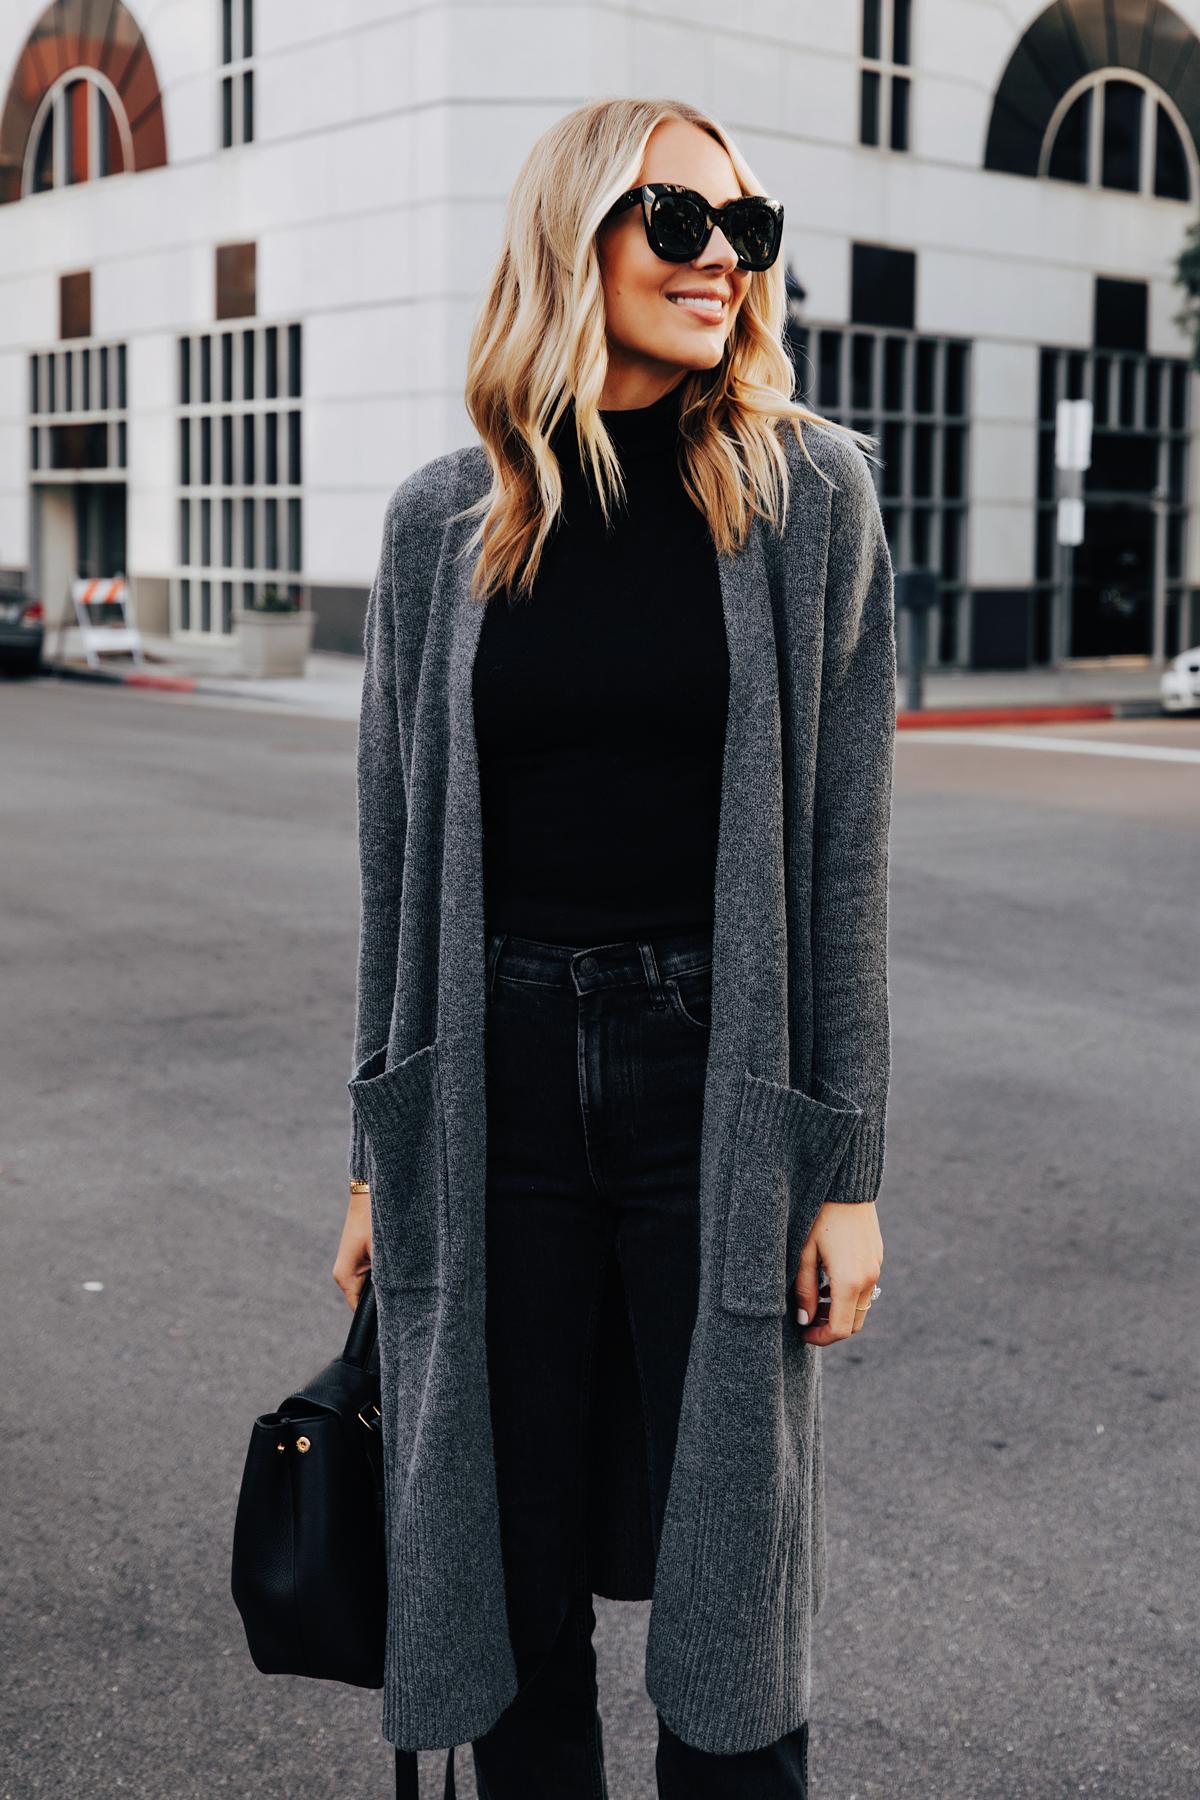 Fashion Jackson Wearing Walmart Scoop Long Grey Cardigan Black Top Black Jeans 1